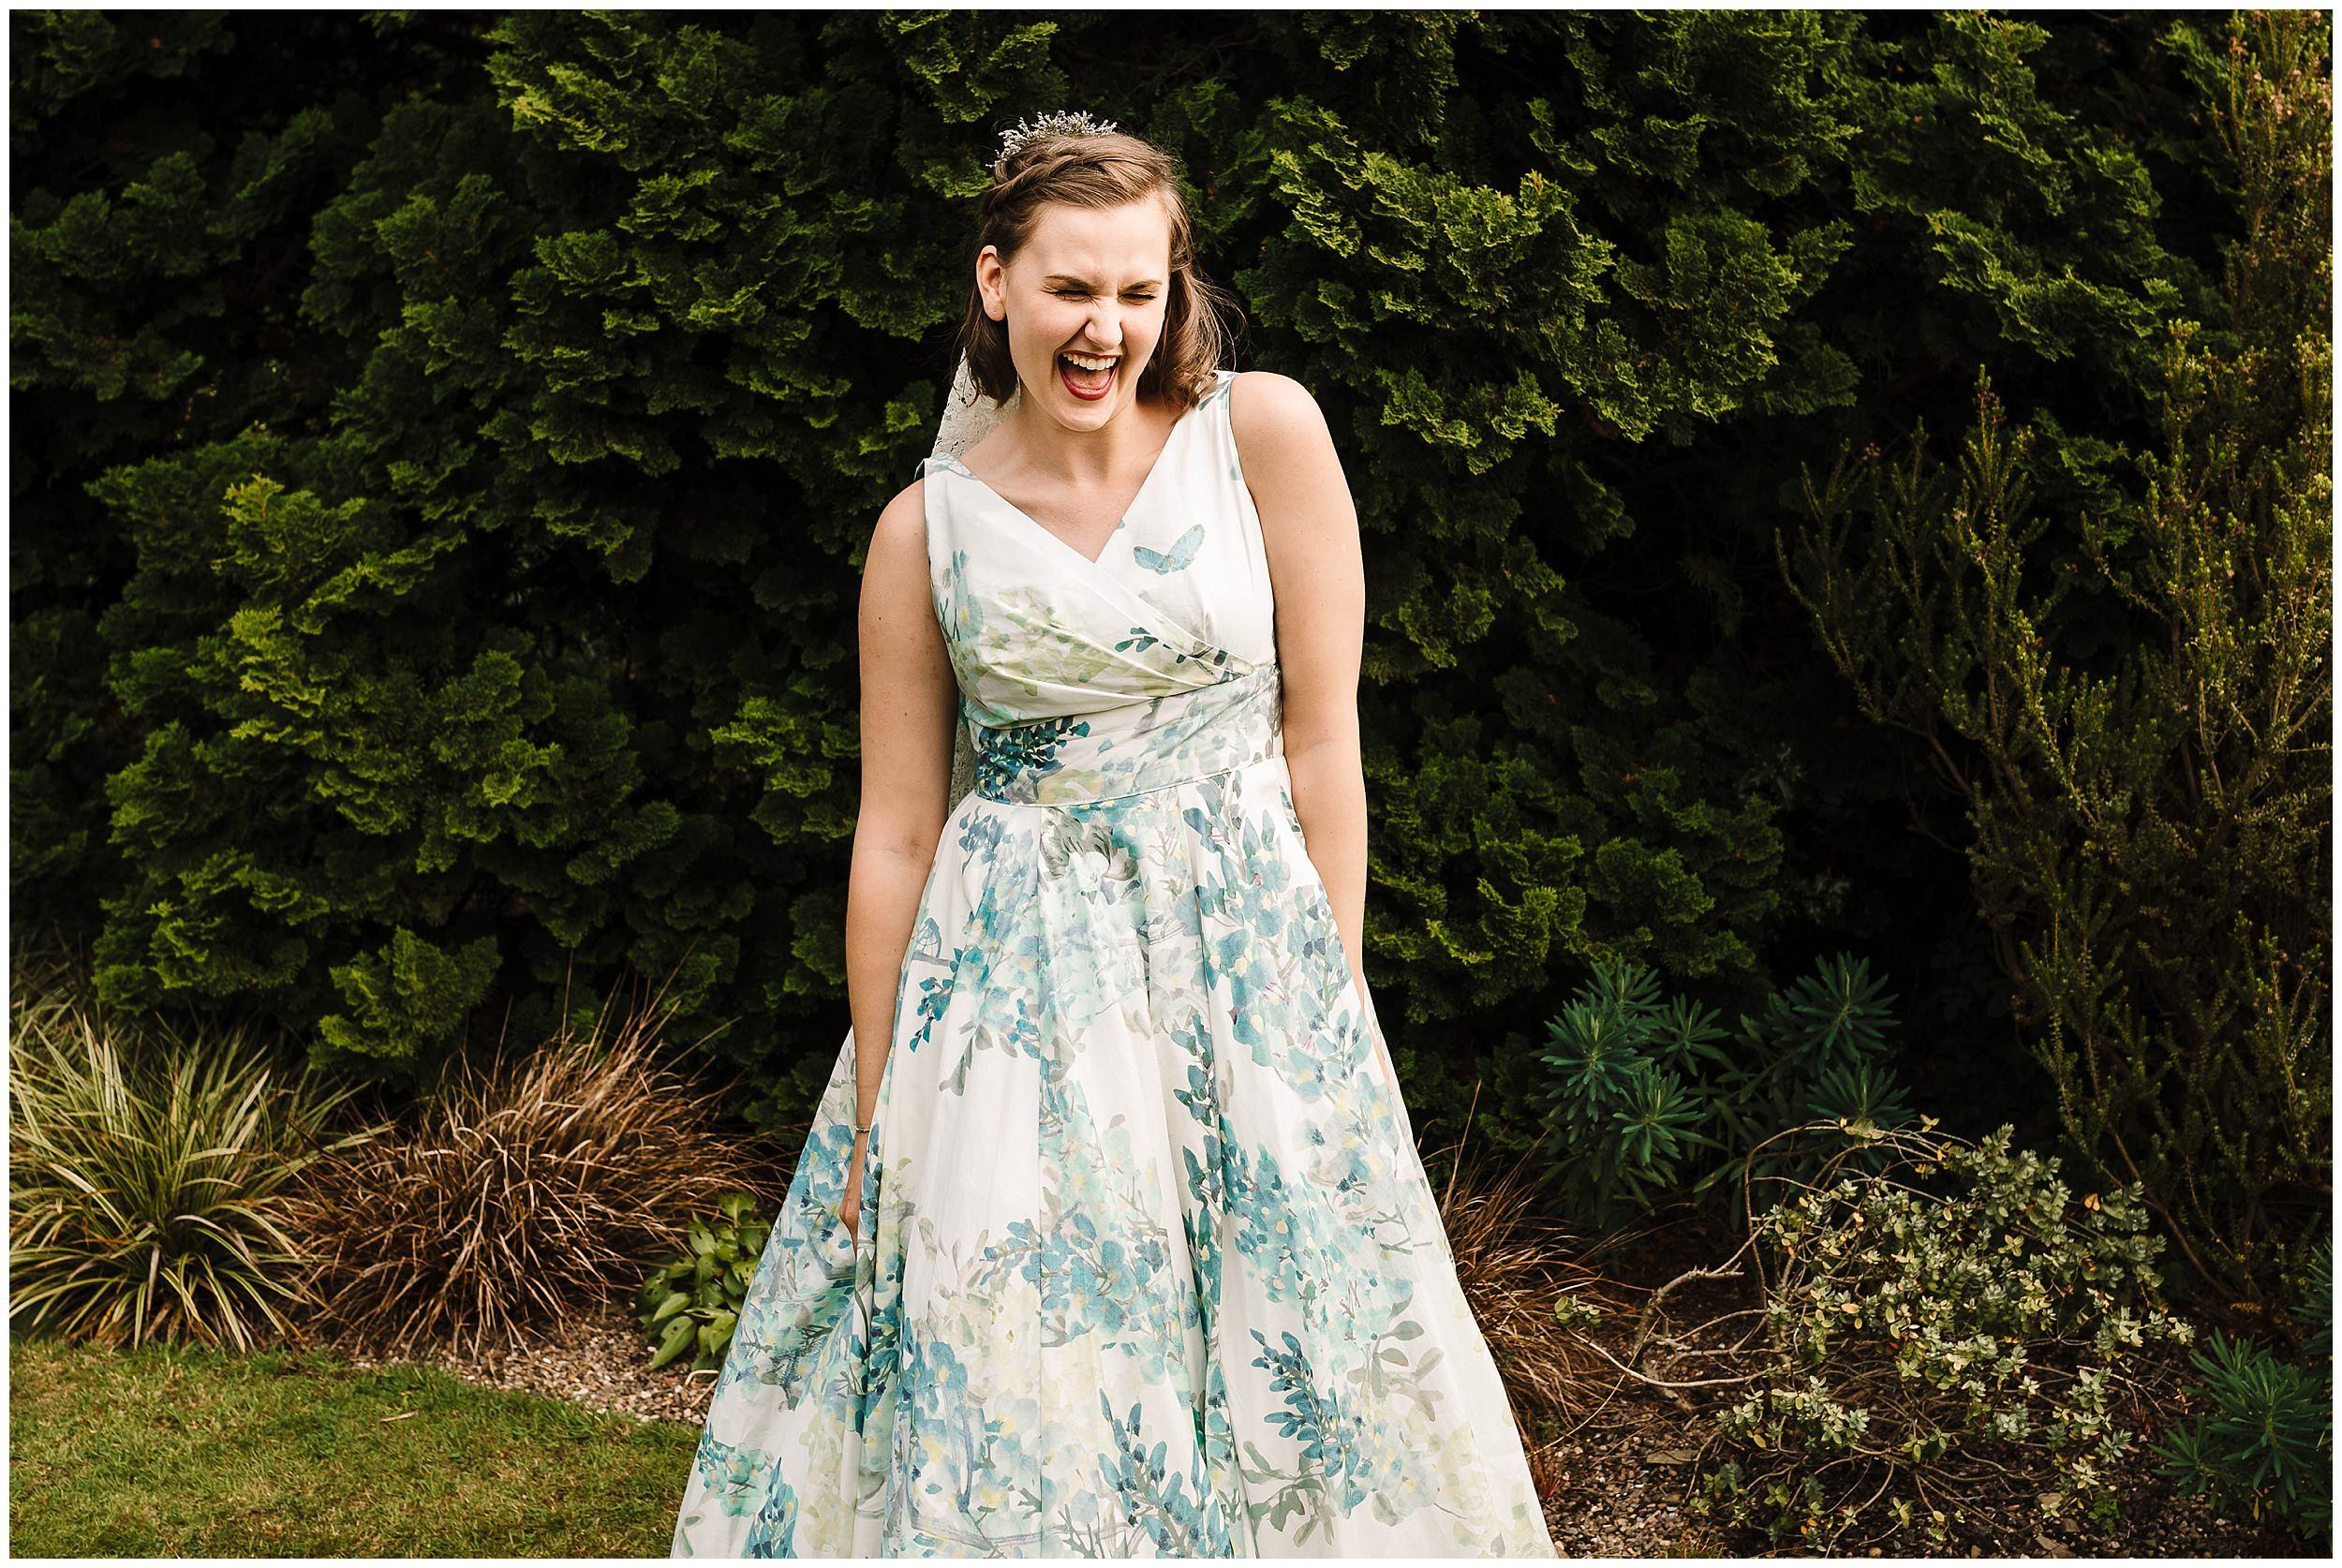 YORKSHIRE OUTDOOR WEDDING PHOTOGRAPHER LUCY ALEX_0025.jpg